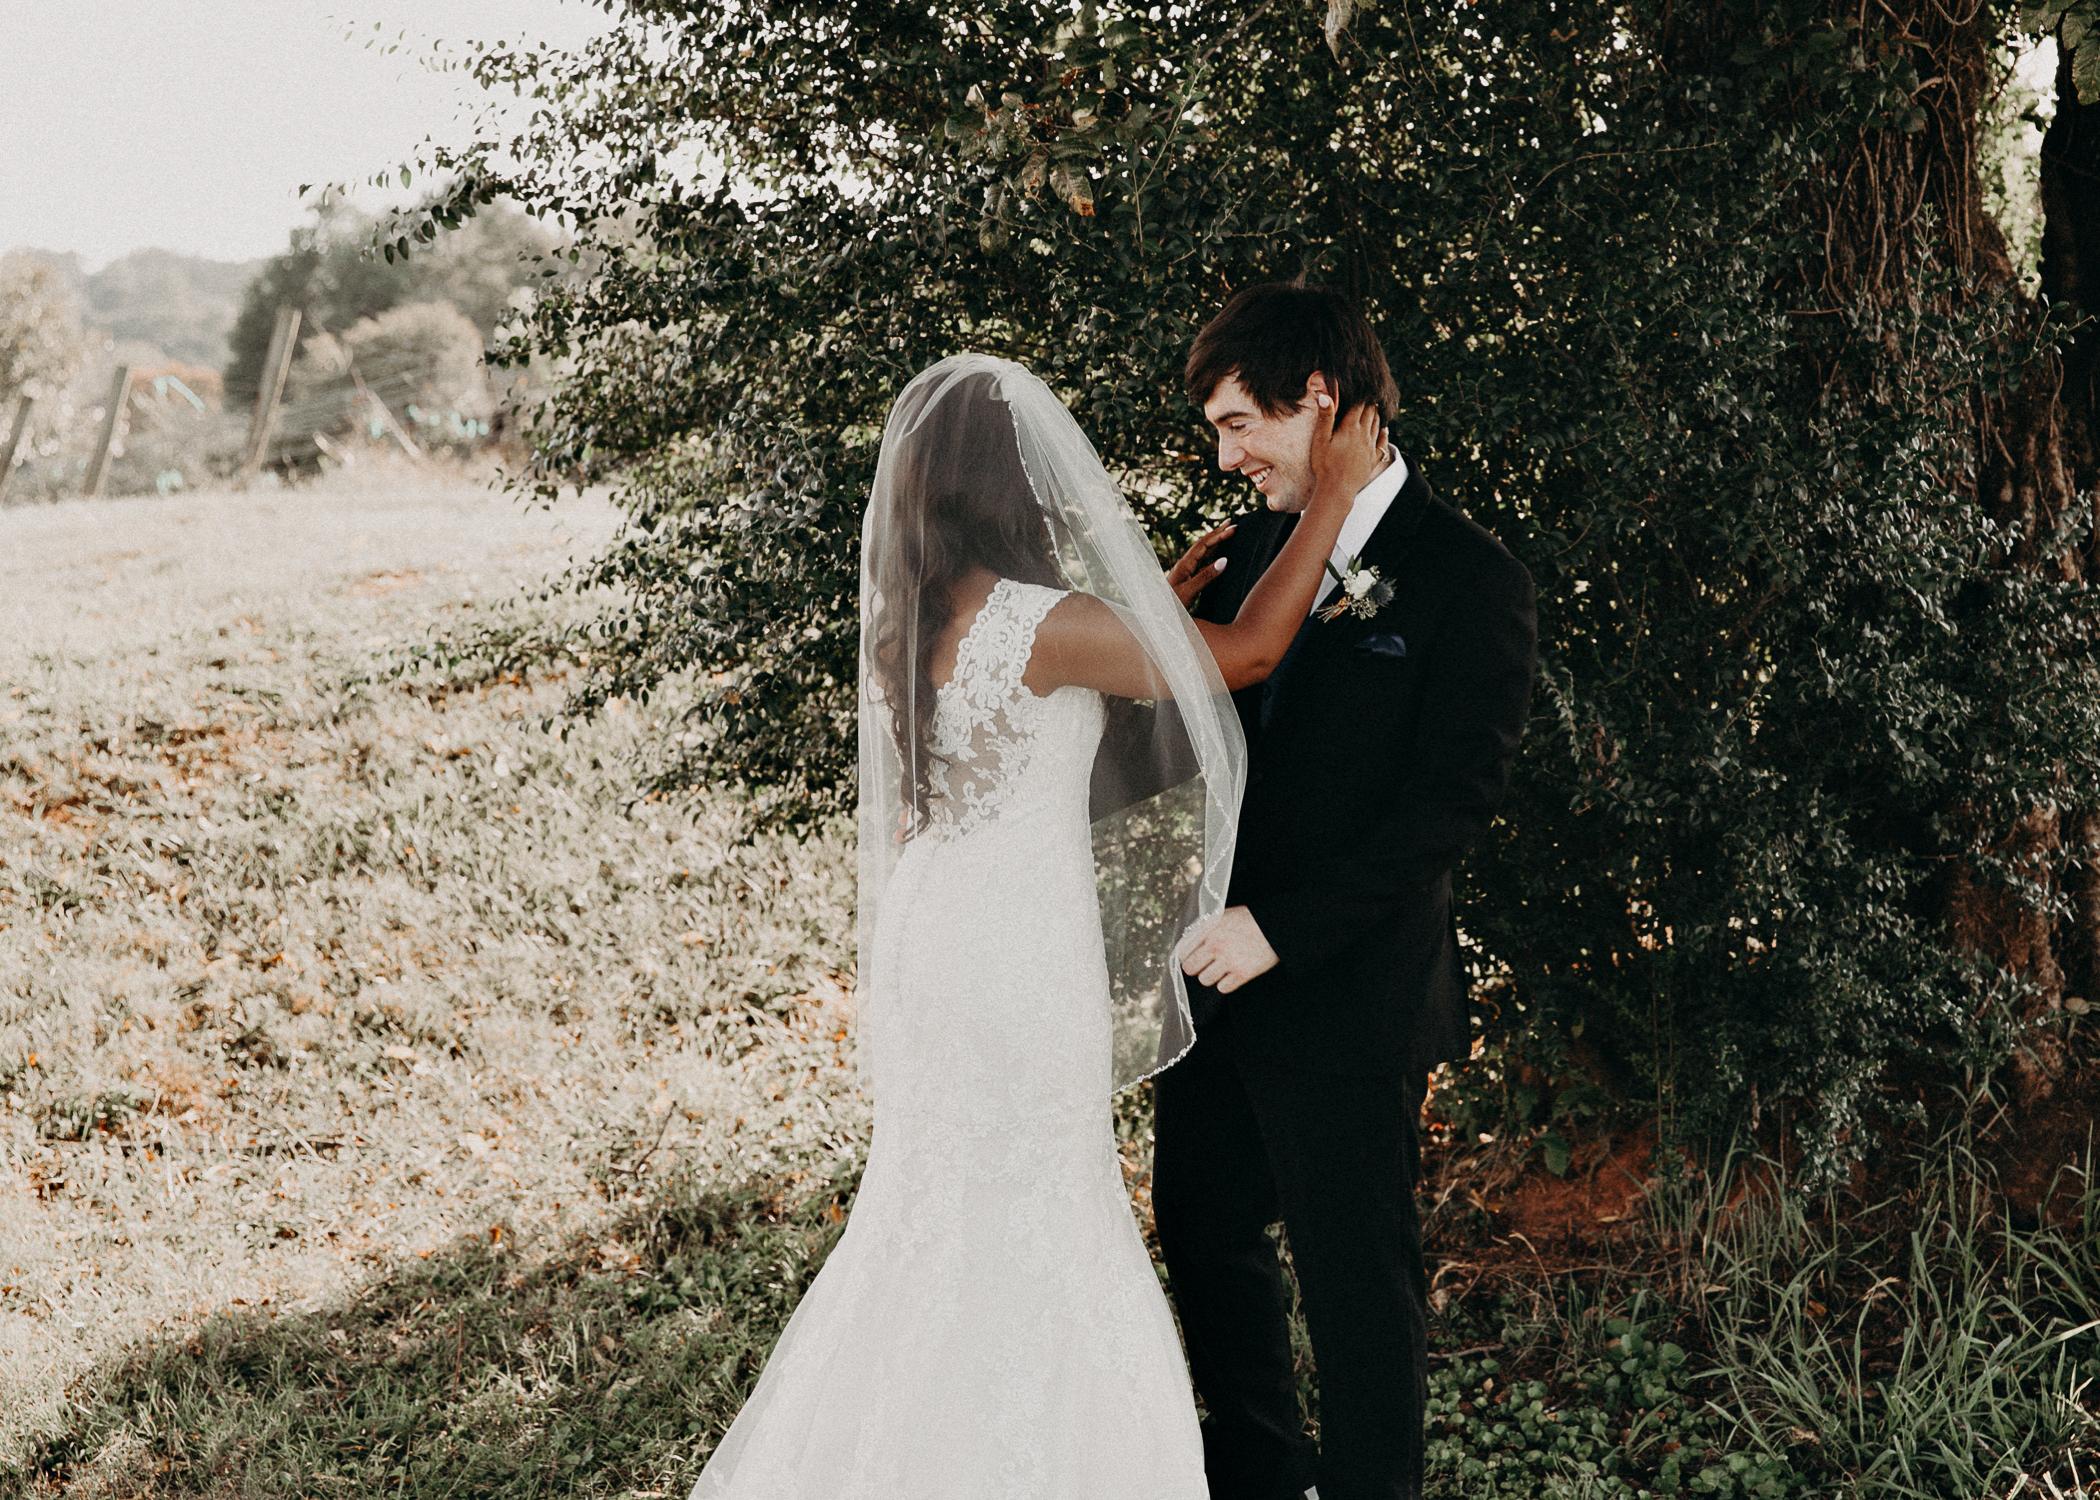 33- Wedding_day_atlanta_georgia_Bride_and_groom_first_look_and_portraits_aline_marin_photography.jpg